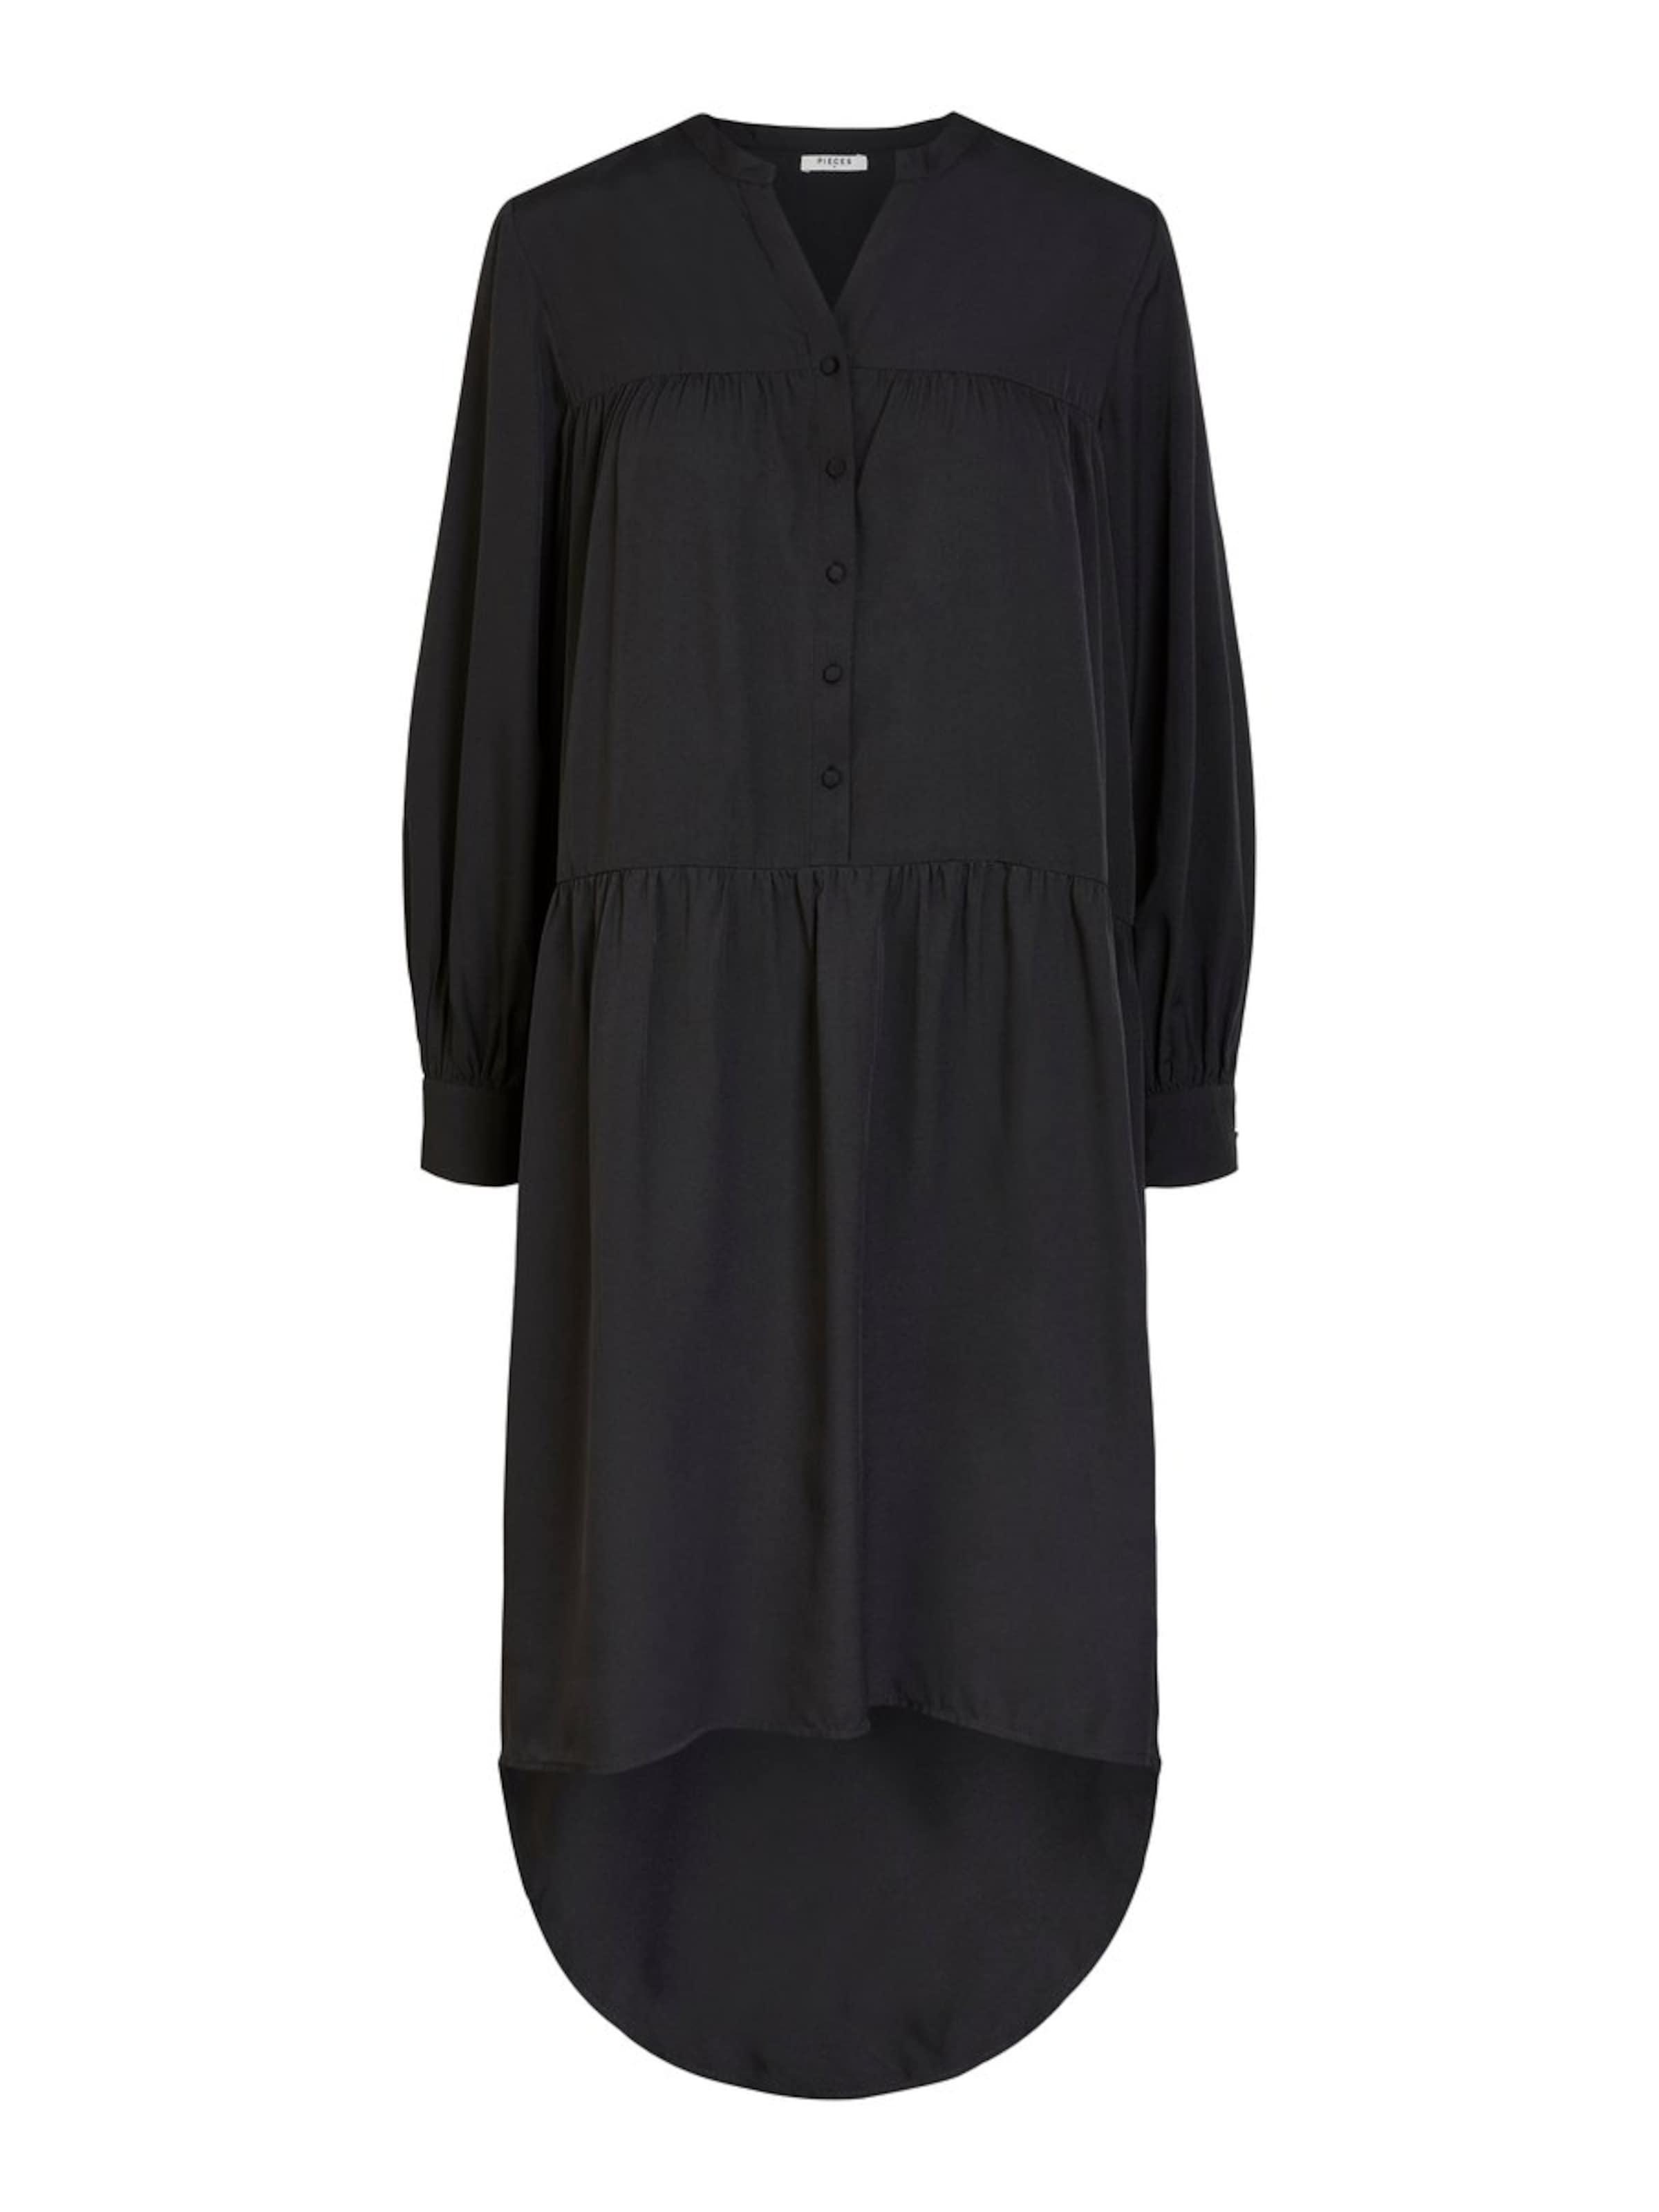 chemise Pieces Noir Noir chemise Robe Robe Pieces Robe Pieces En En chemise En CrdxoWBe